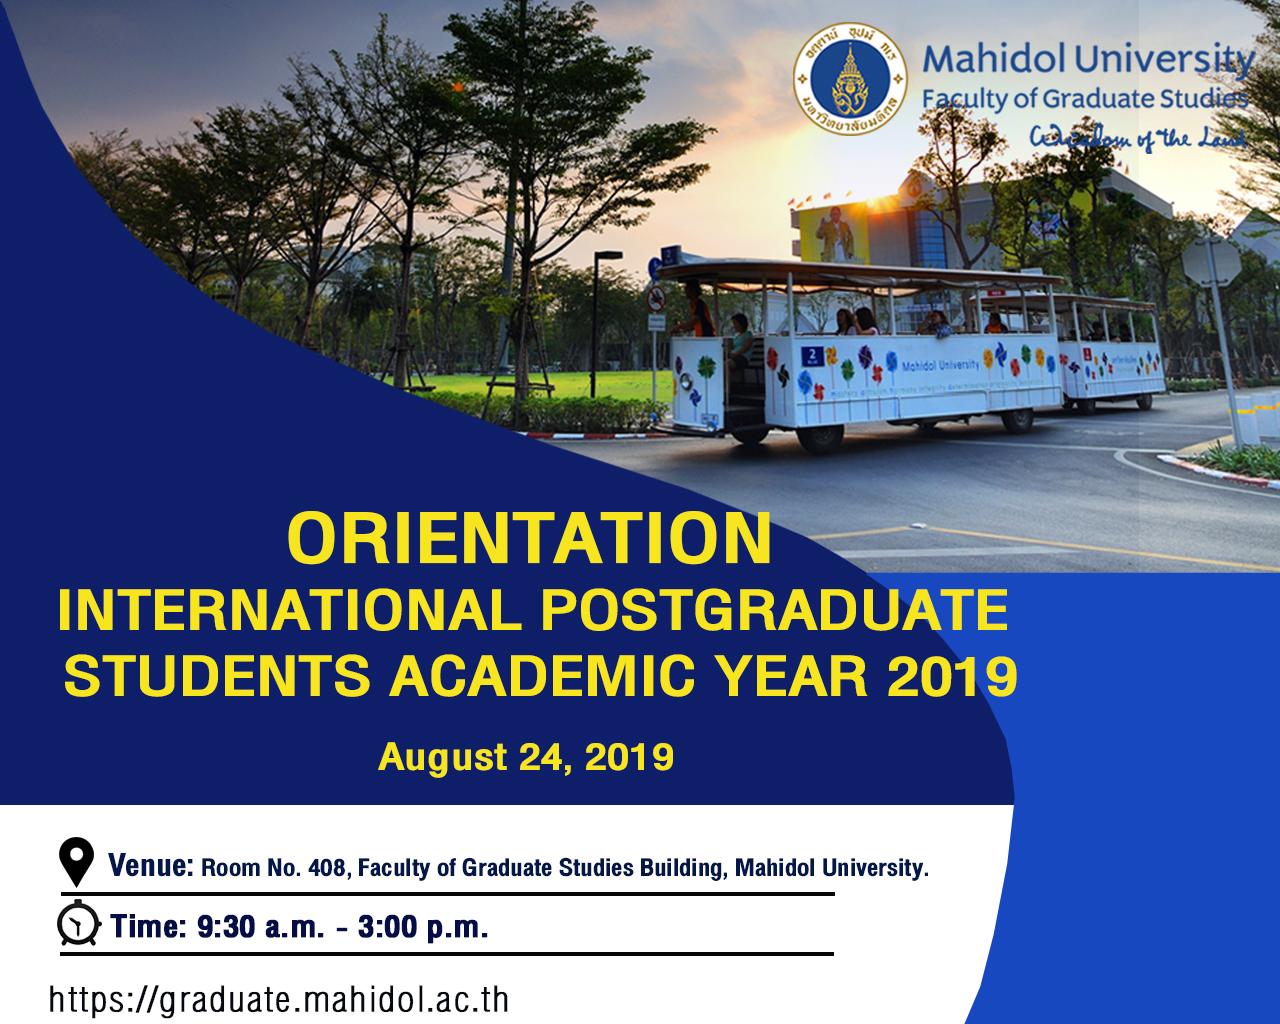 Orientation International Postgraduate Students Academic Year 2019